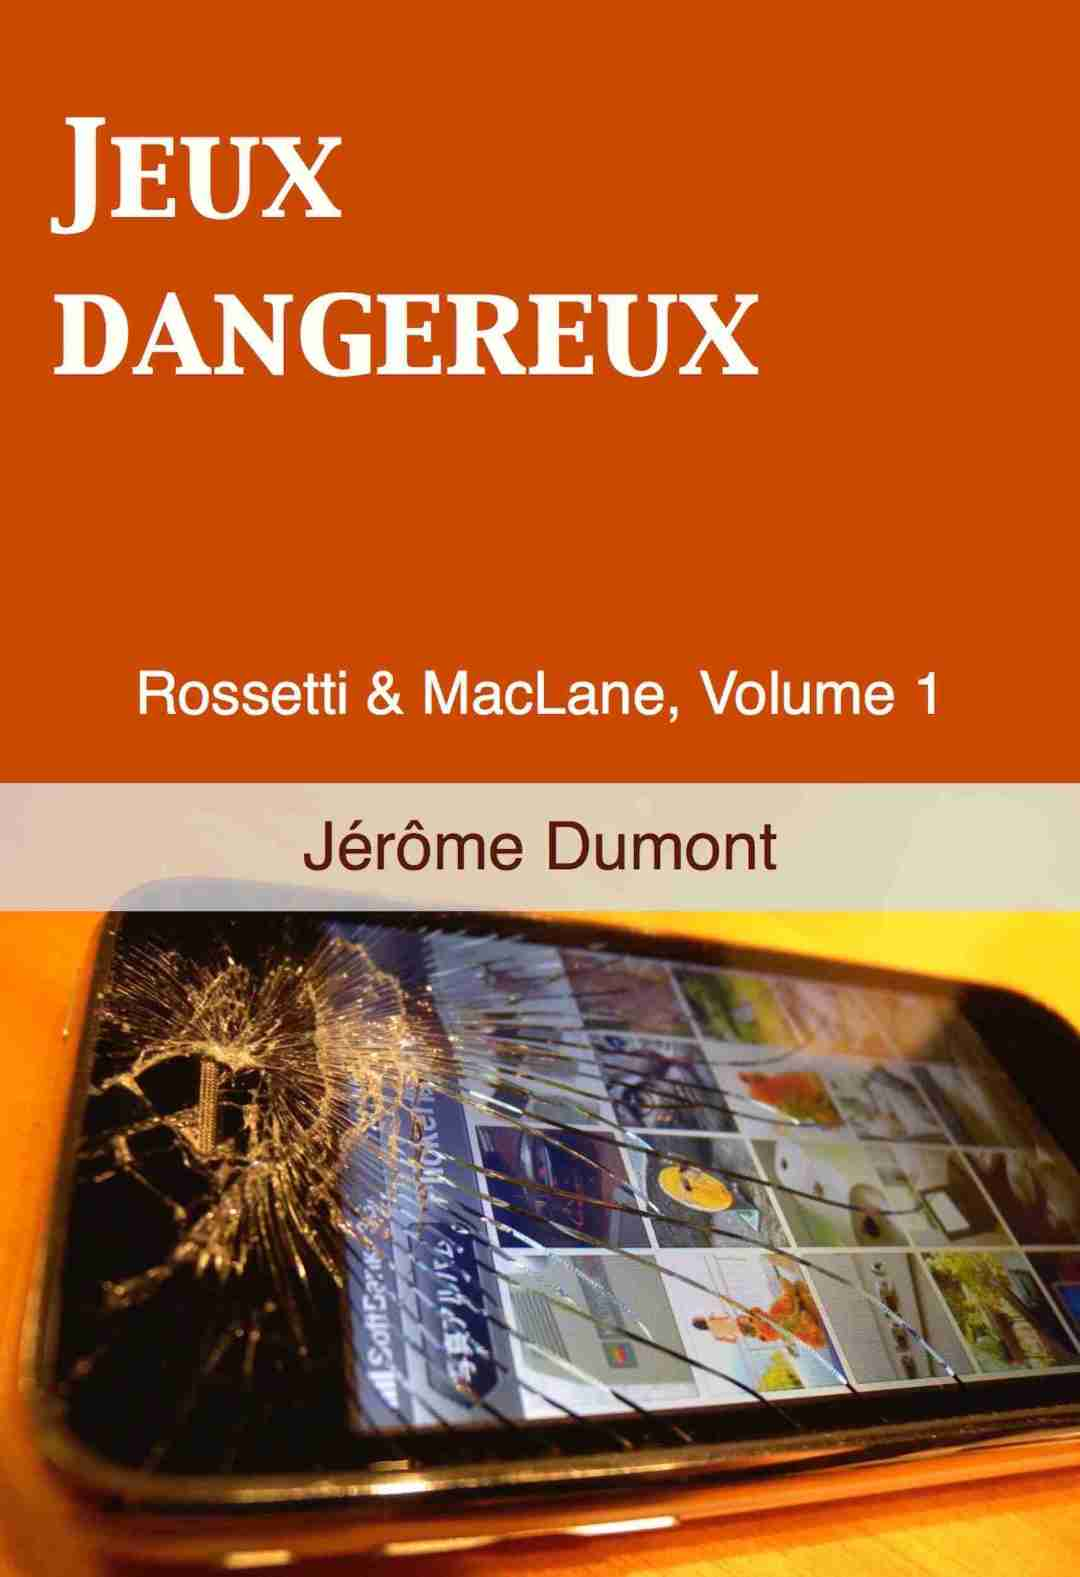 jeux-dangereux-rossetti-maclane-1